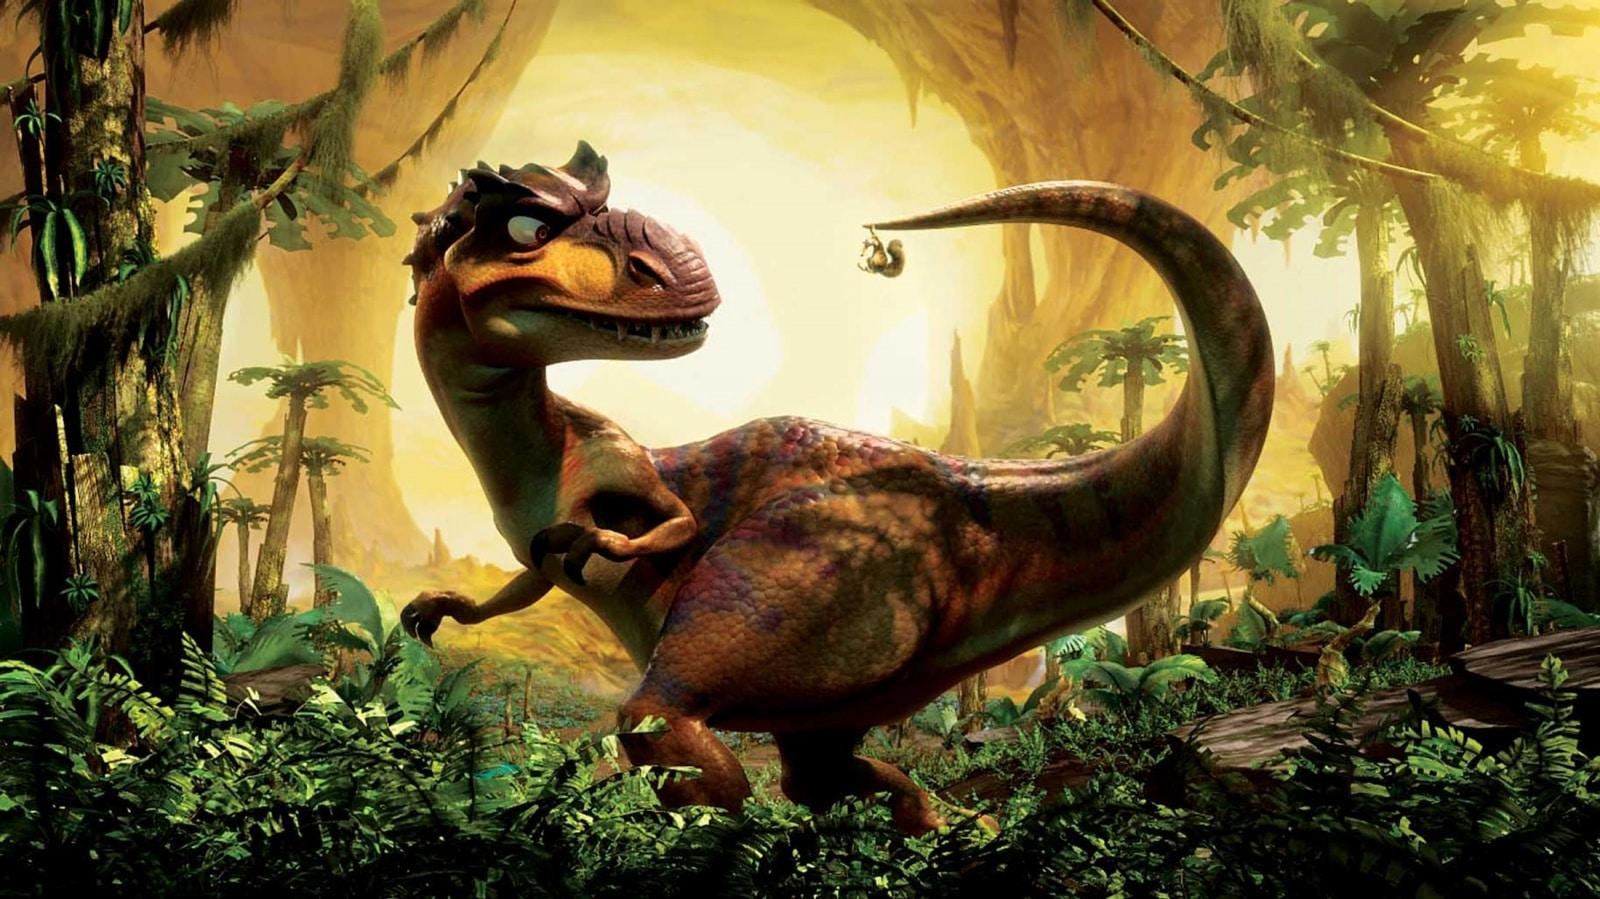 Wallpaper Dino Cute More Dinosaur Wallpaper Dinopit